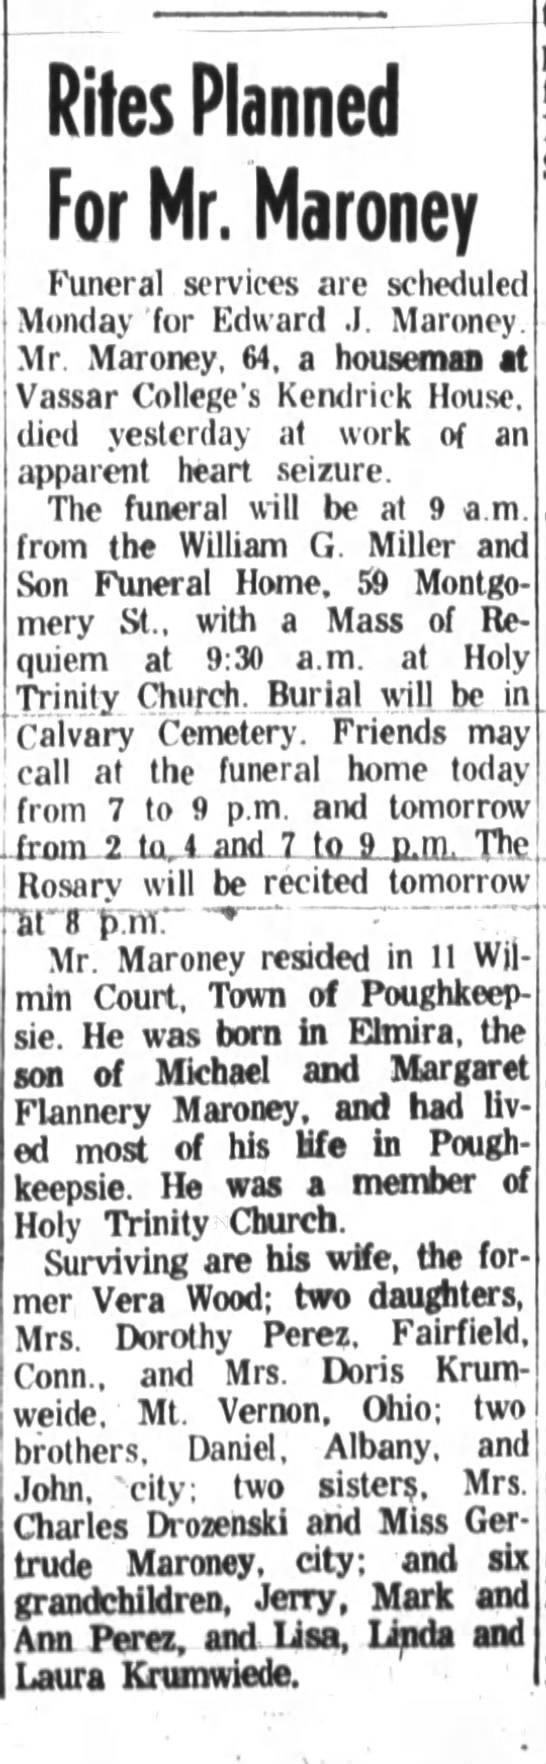 Edward J. Maroney